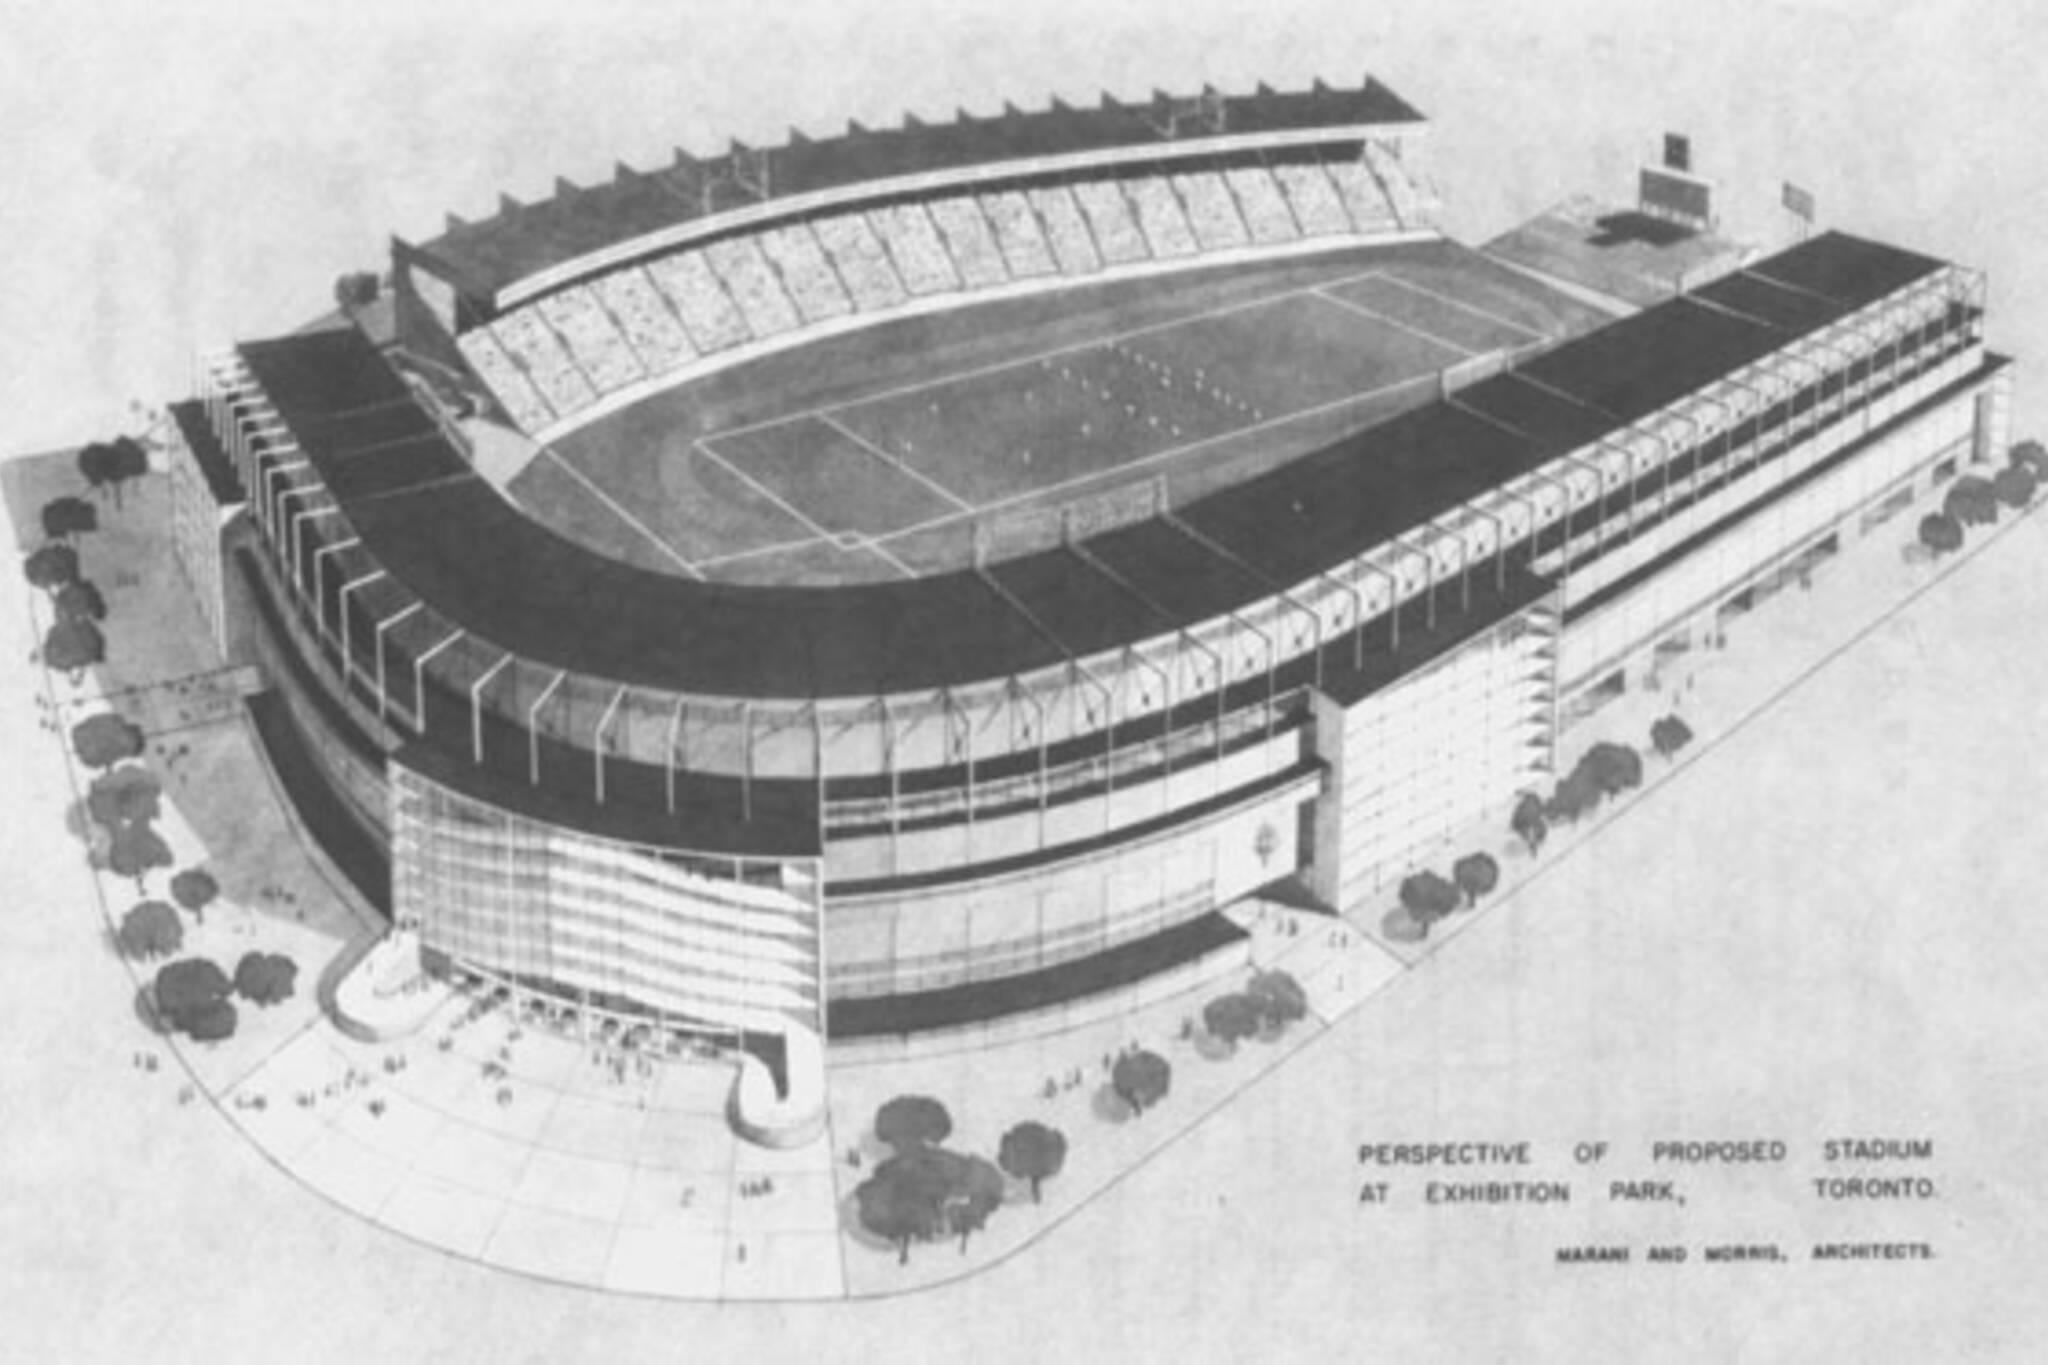 toronto exhibition stadium